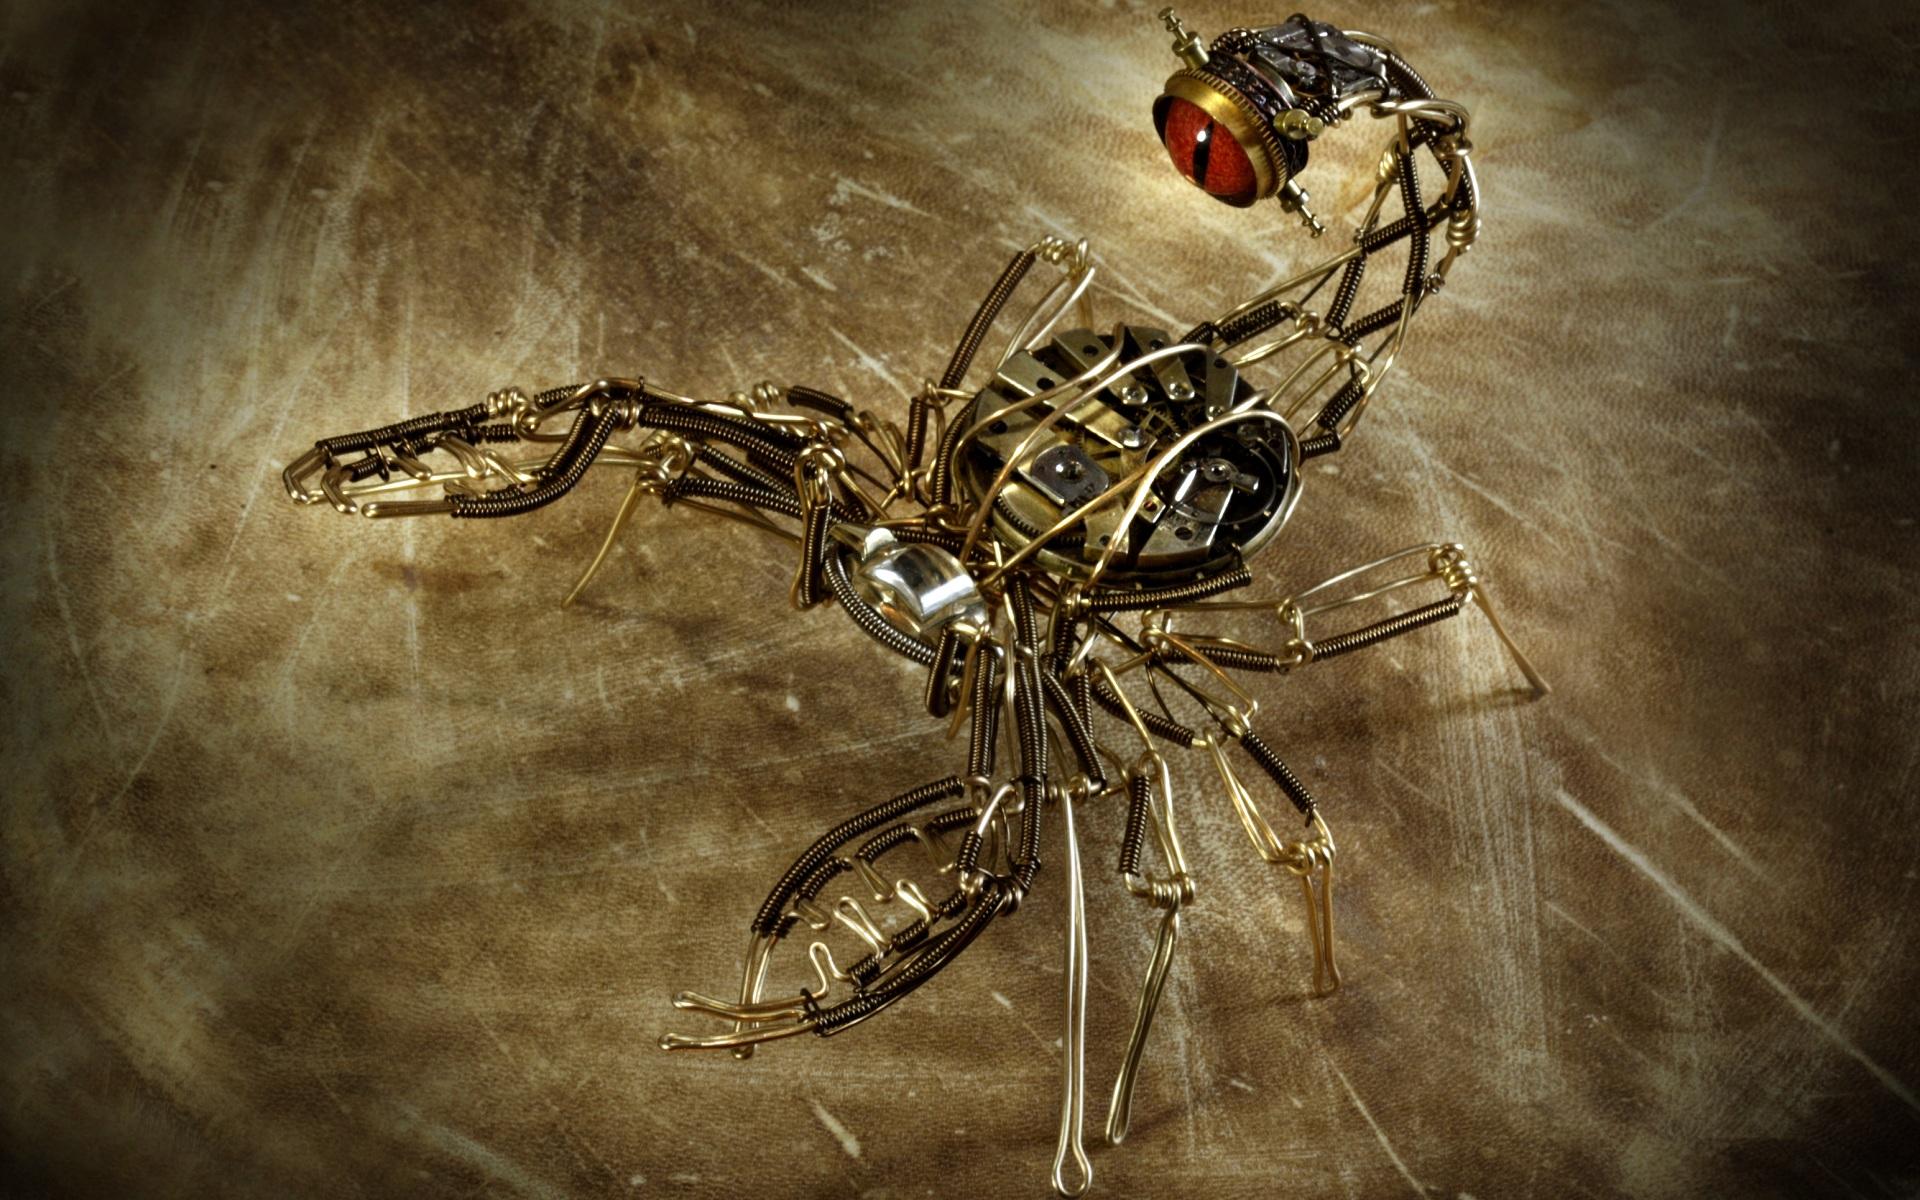 Steampunk Machine Scorpion Mechanical Wallpaper 1920x1200 62476 Wallpaperup